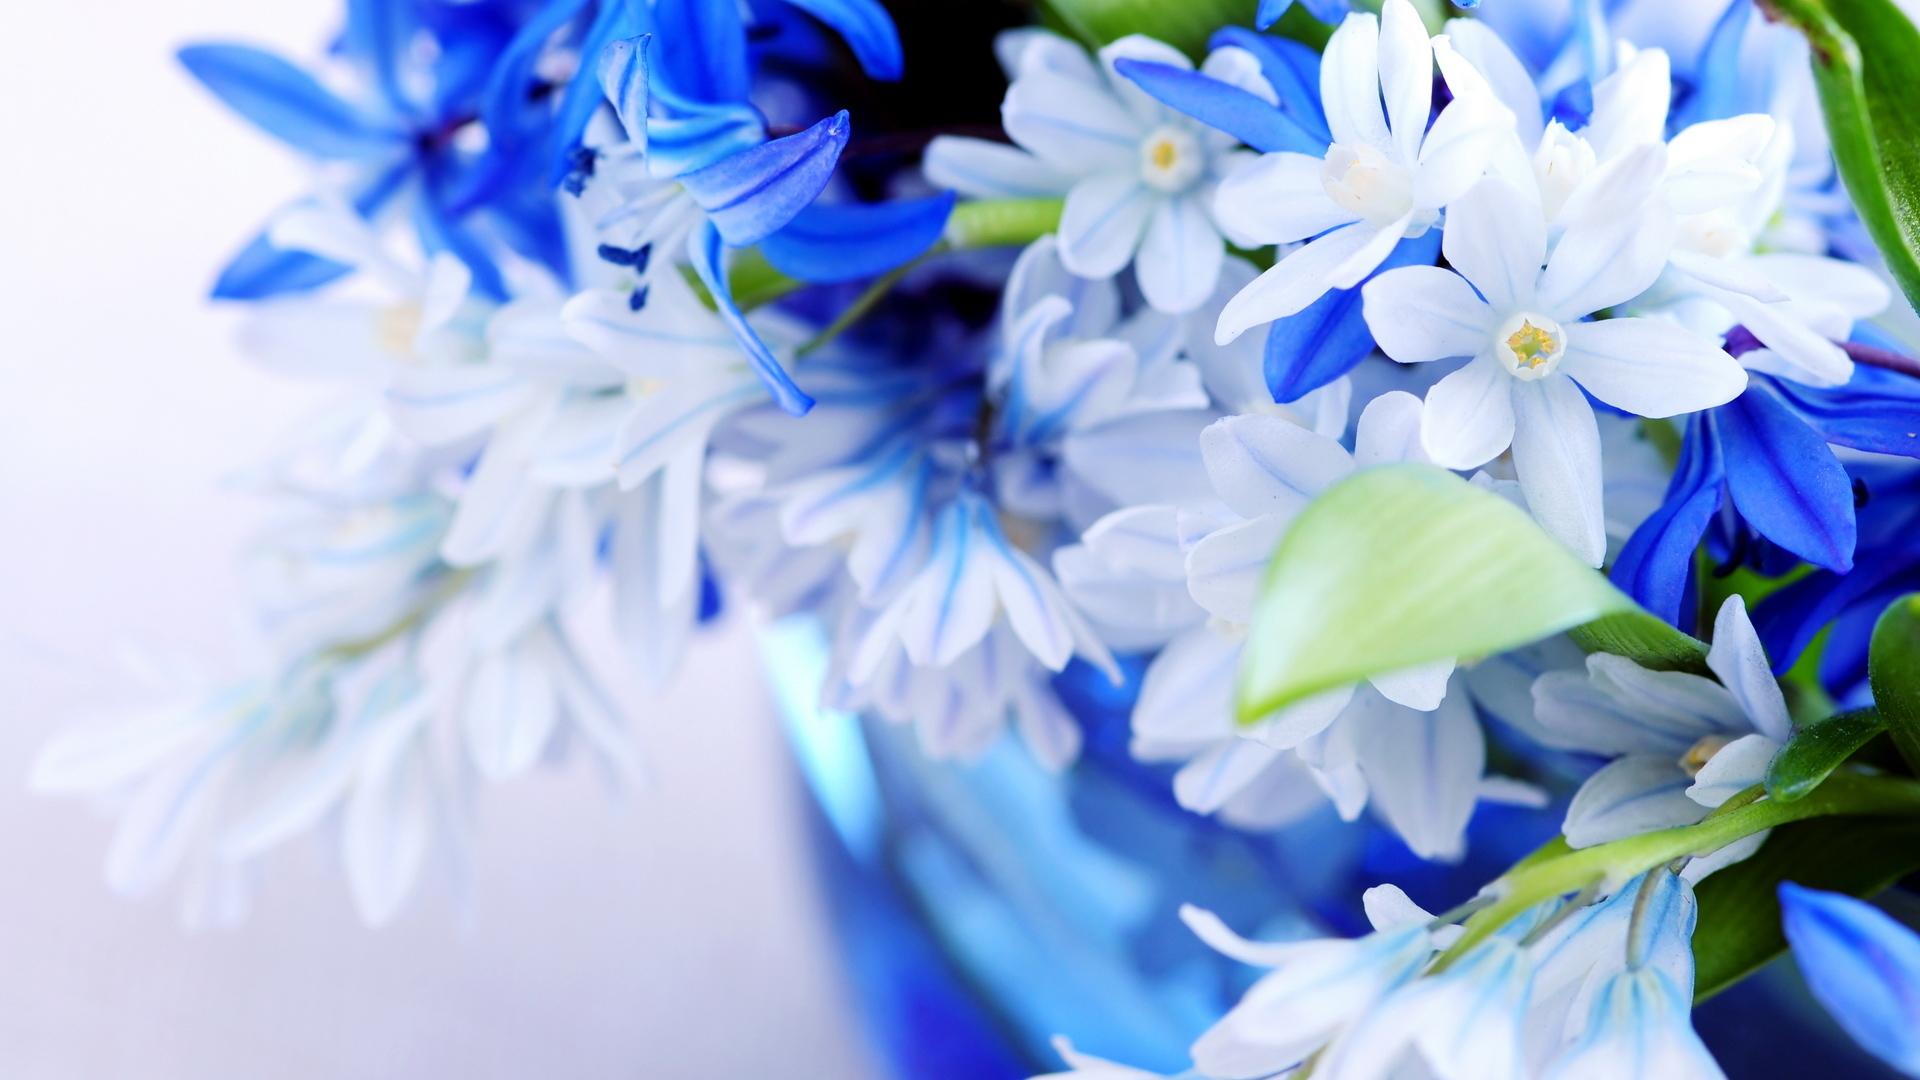 Full Screen Flowers 7785 Wallpaper Hd 1920x1080